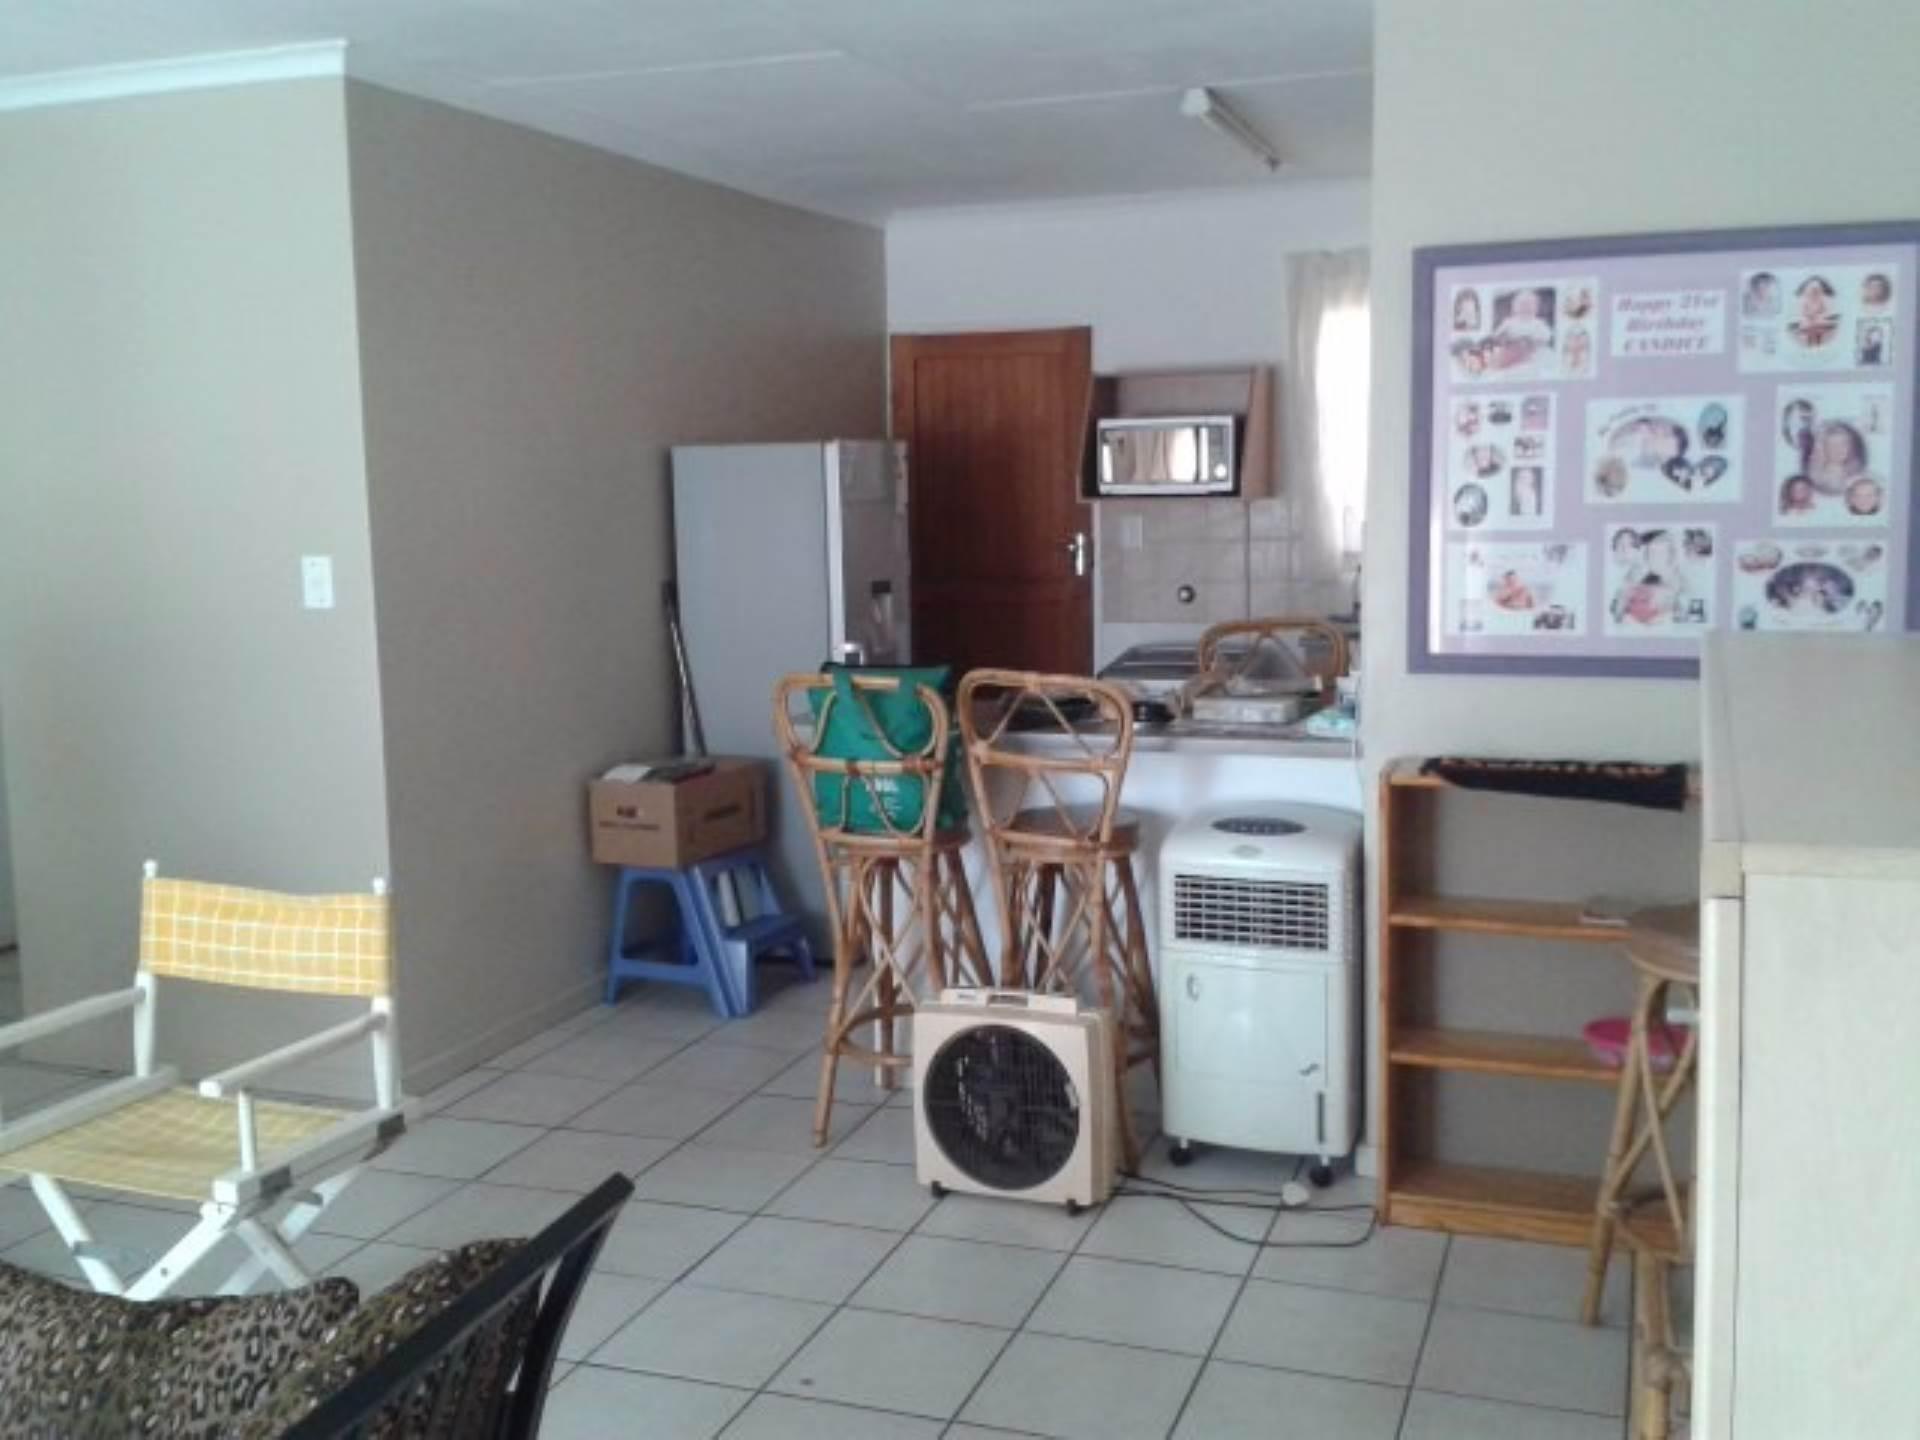 Centurion Central property for sale. Ref No: 13559695. Picture no 2